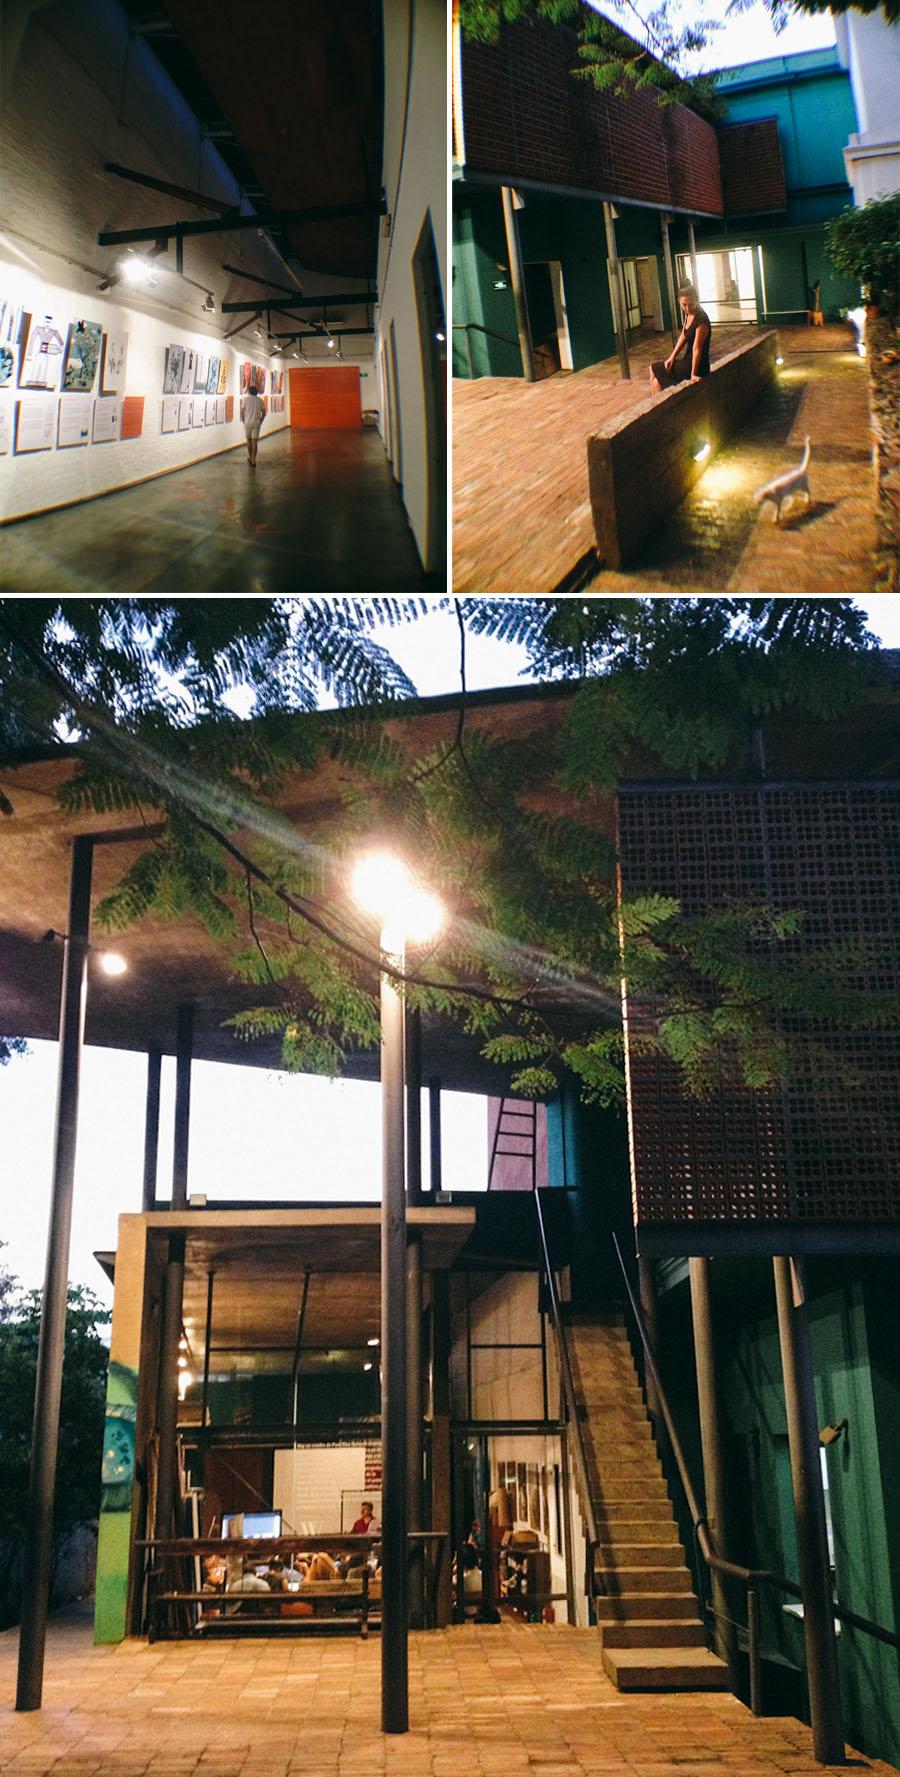 Centro Cultural de España Juan de Salazar en Asunción del Paraguay. Fotos